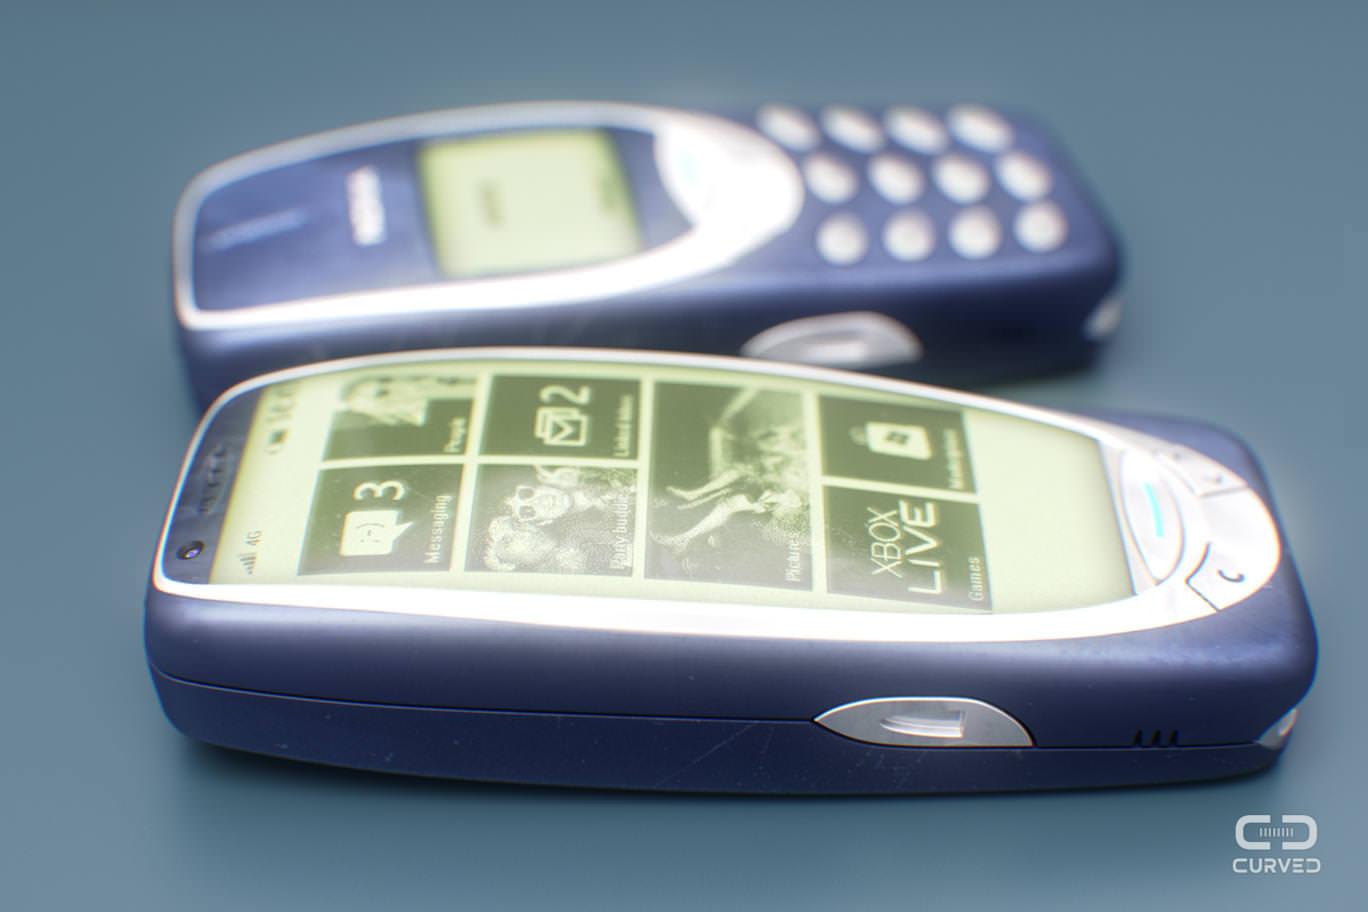 Nokia 3310 ve Ericsson T28s bir ak�ll� telefon olsayd� nas�l olurdu?